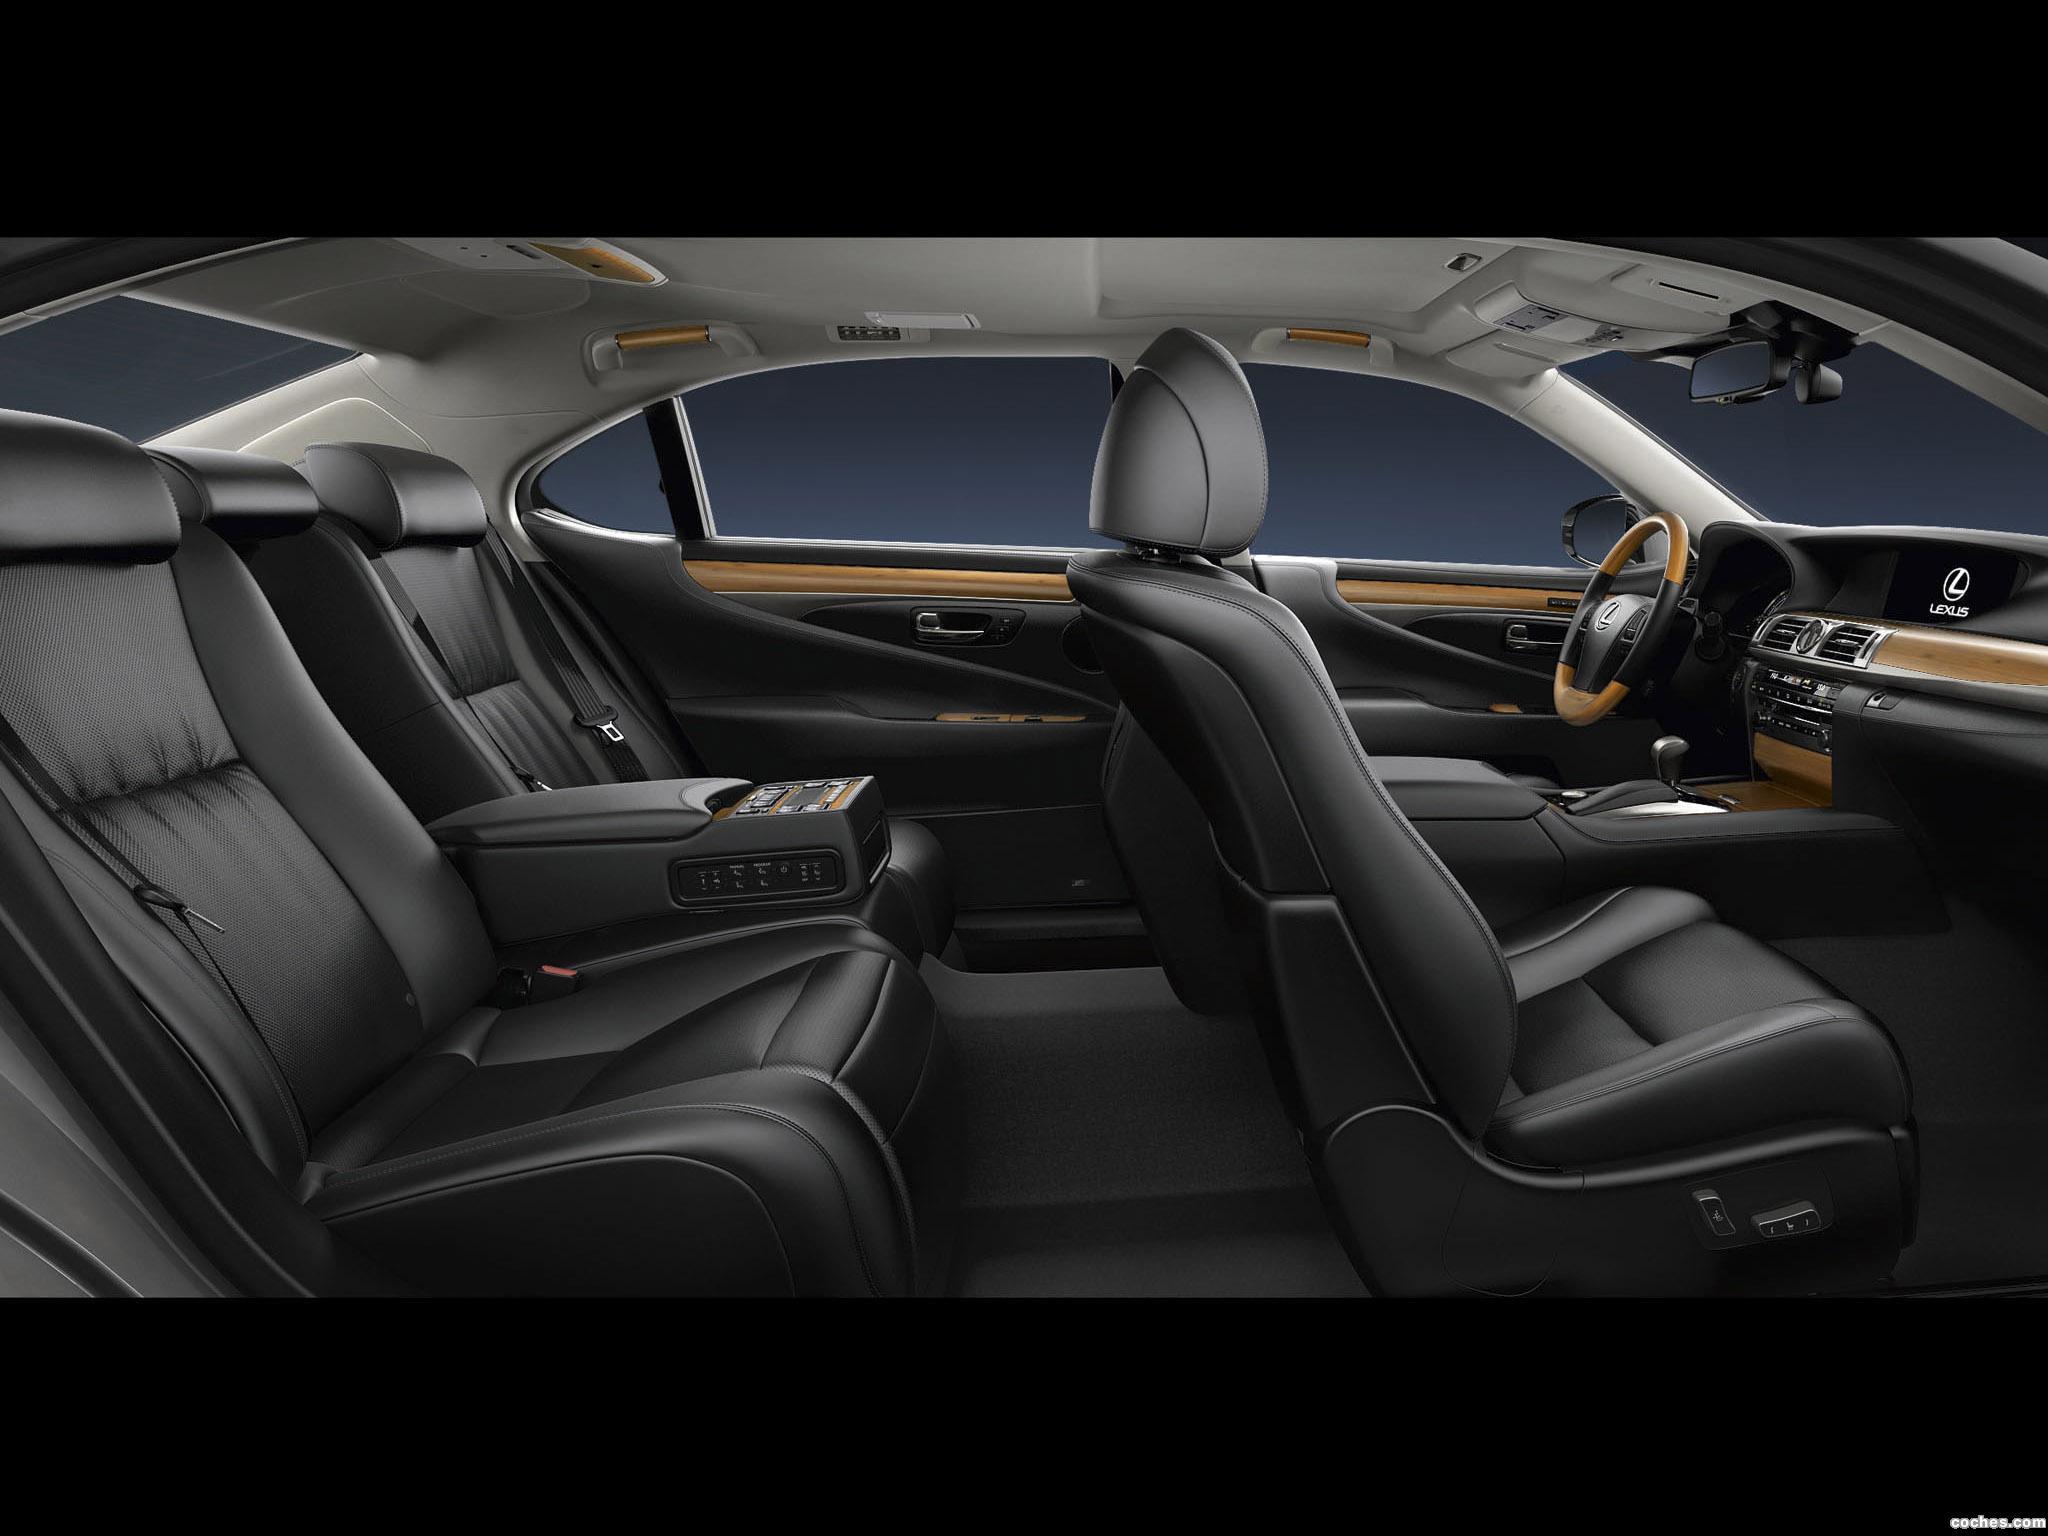 Foto 4 de Lexus LS 600h Europa 2013